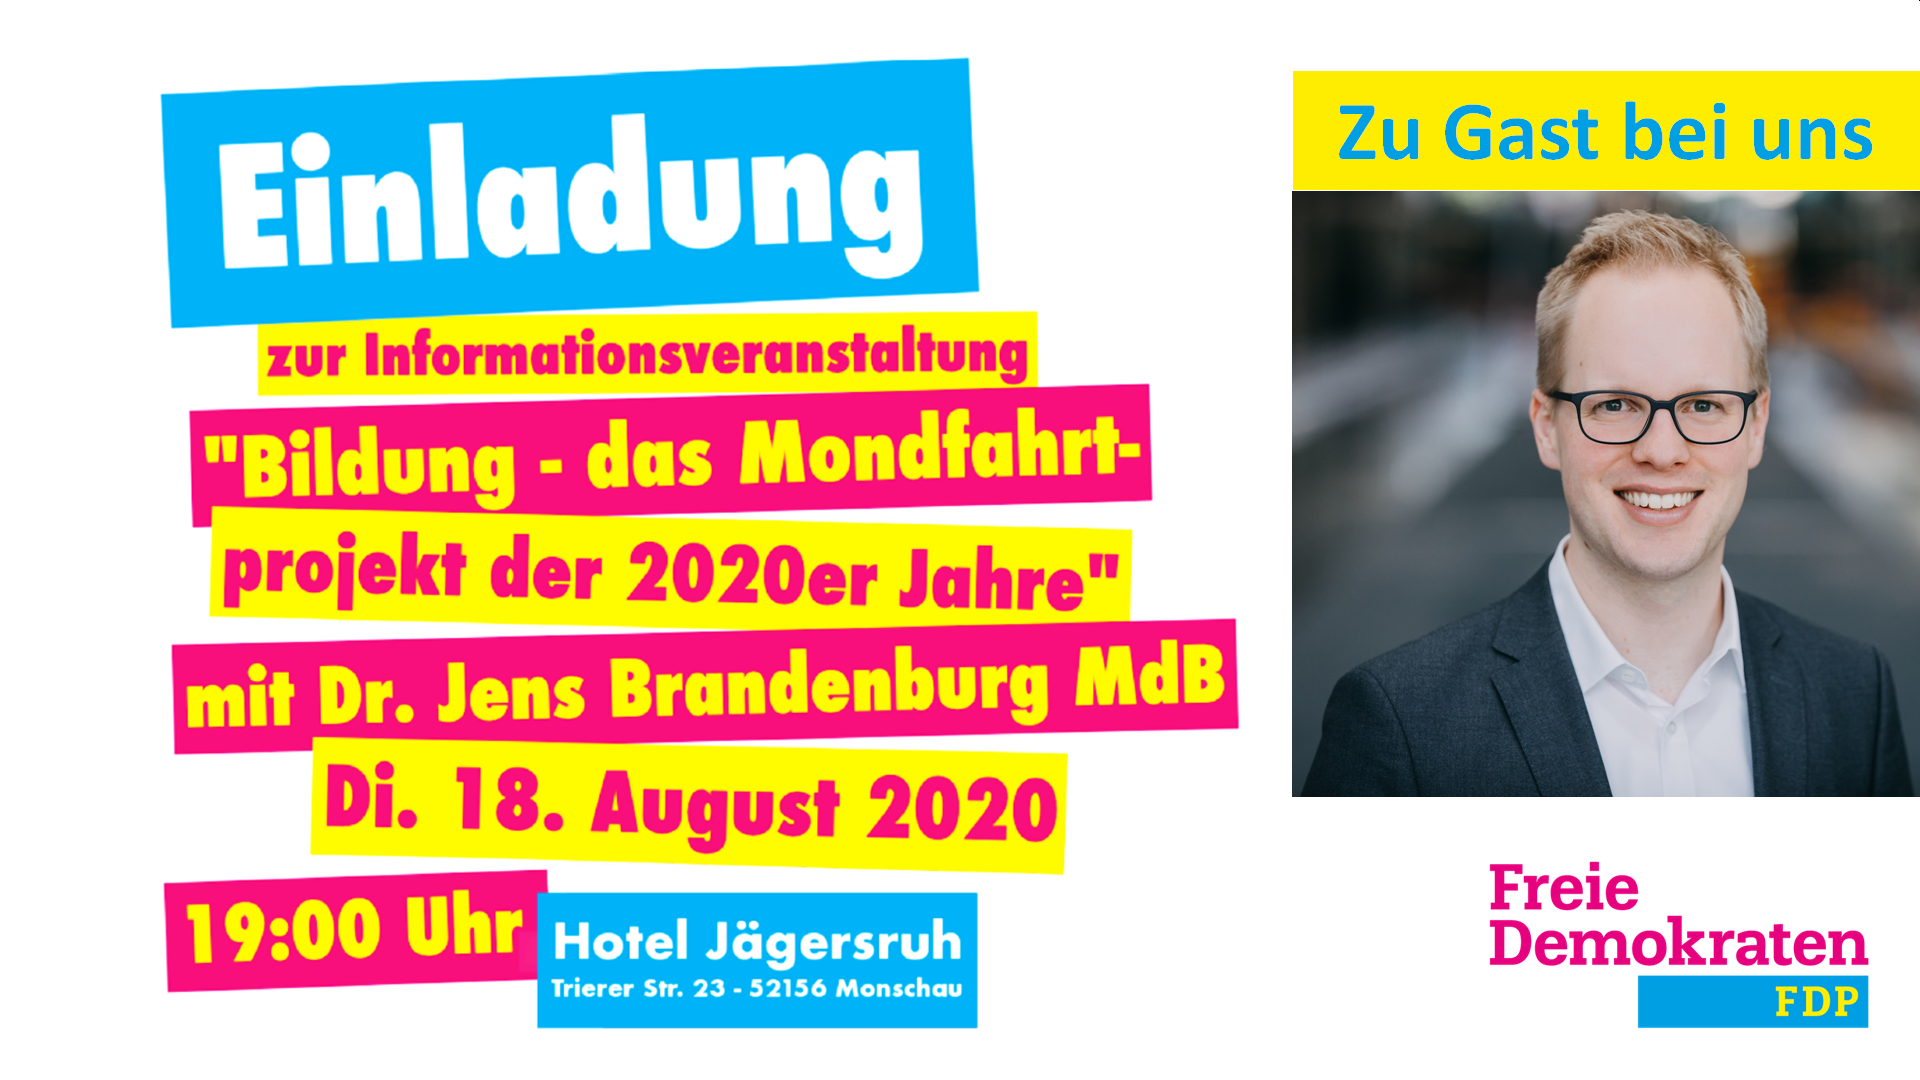 FDP Monschau: Veranstaltung mit Dr. Jens Brandenburg MdB